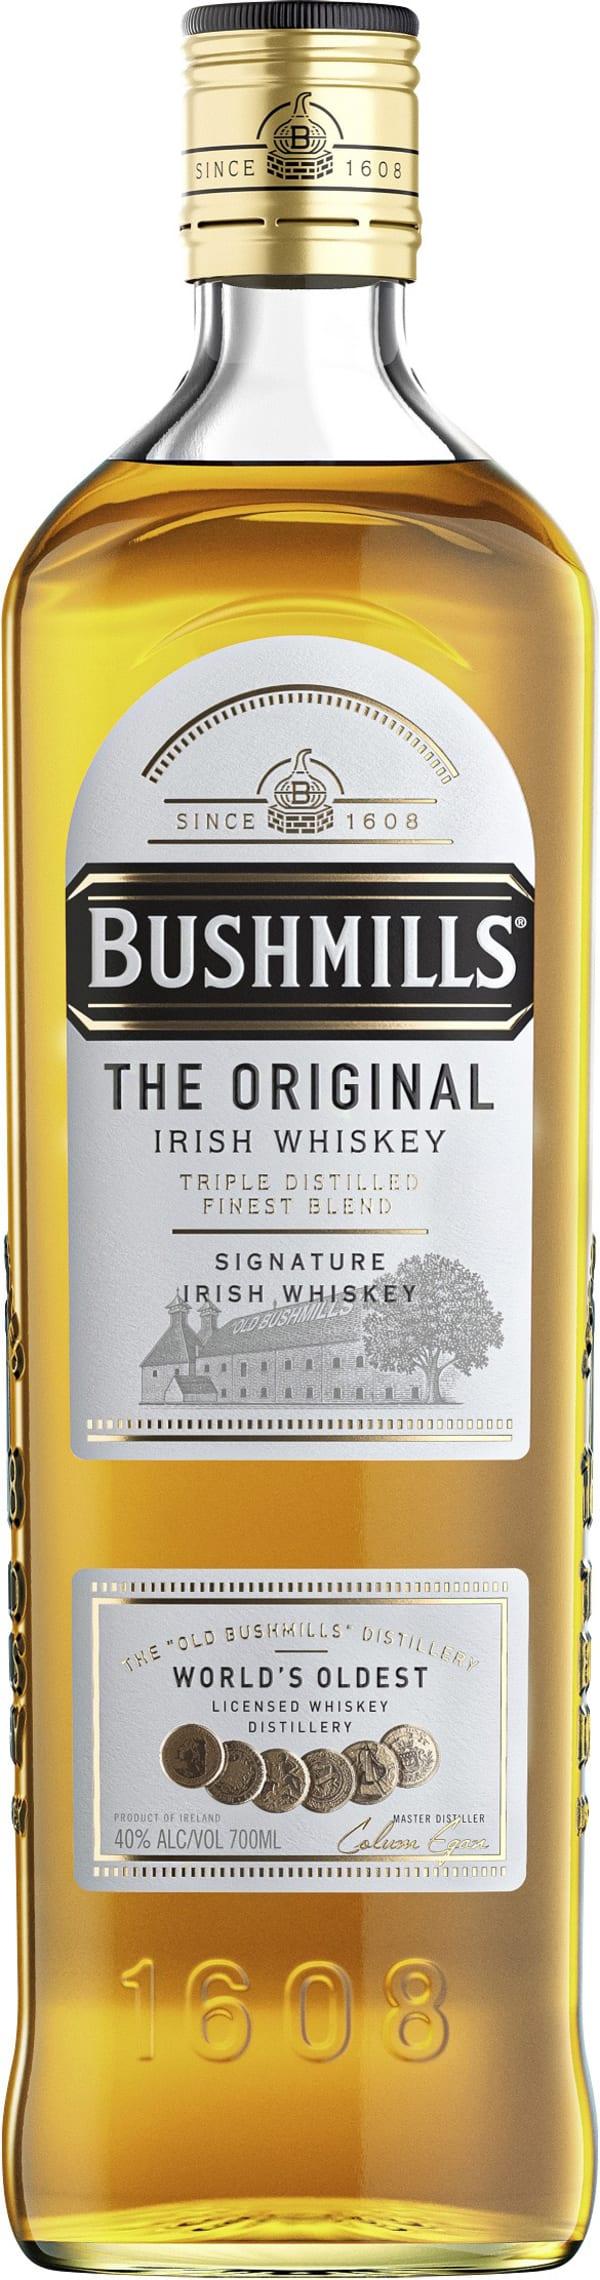 Bushmills